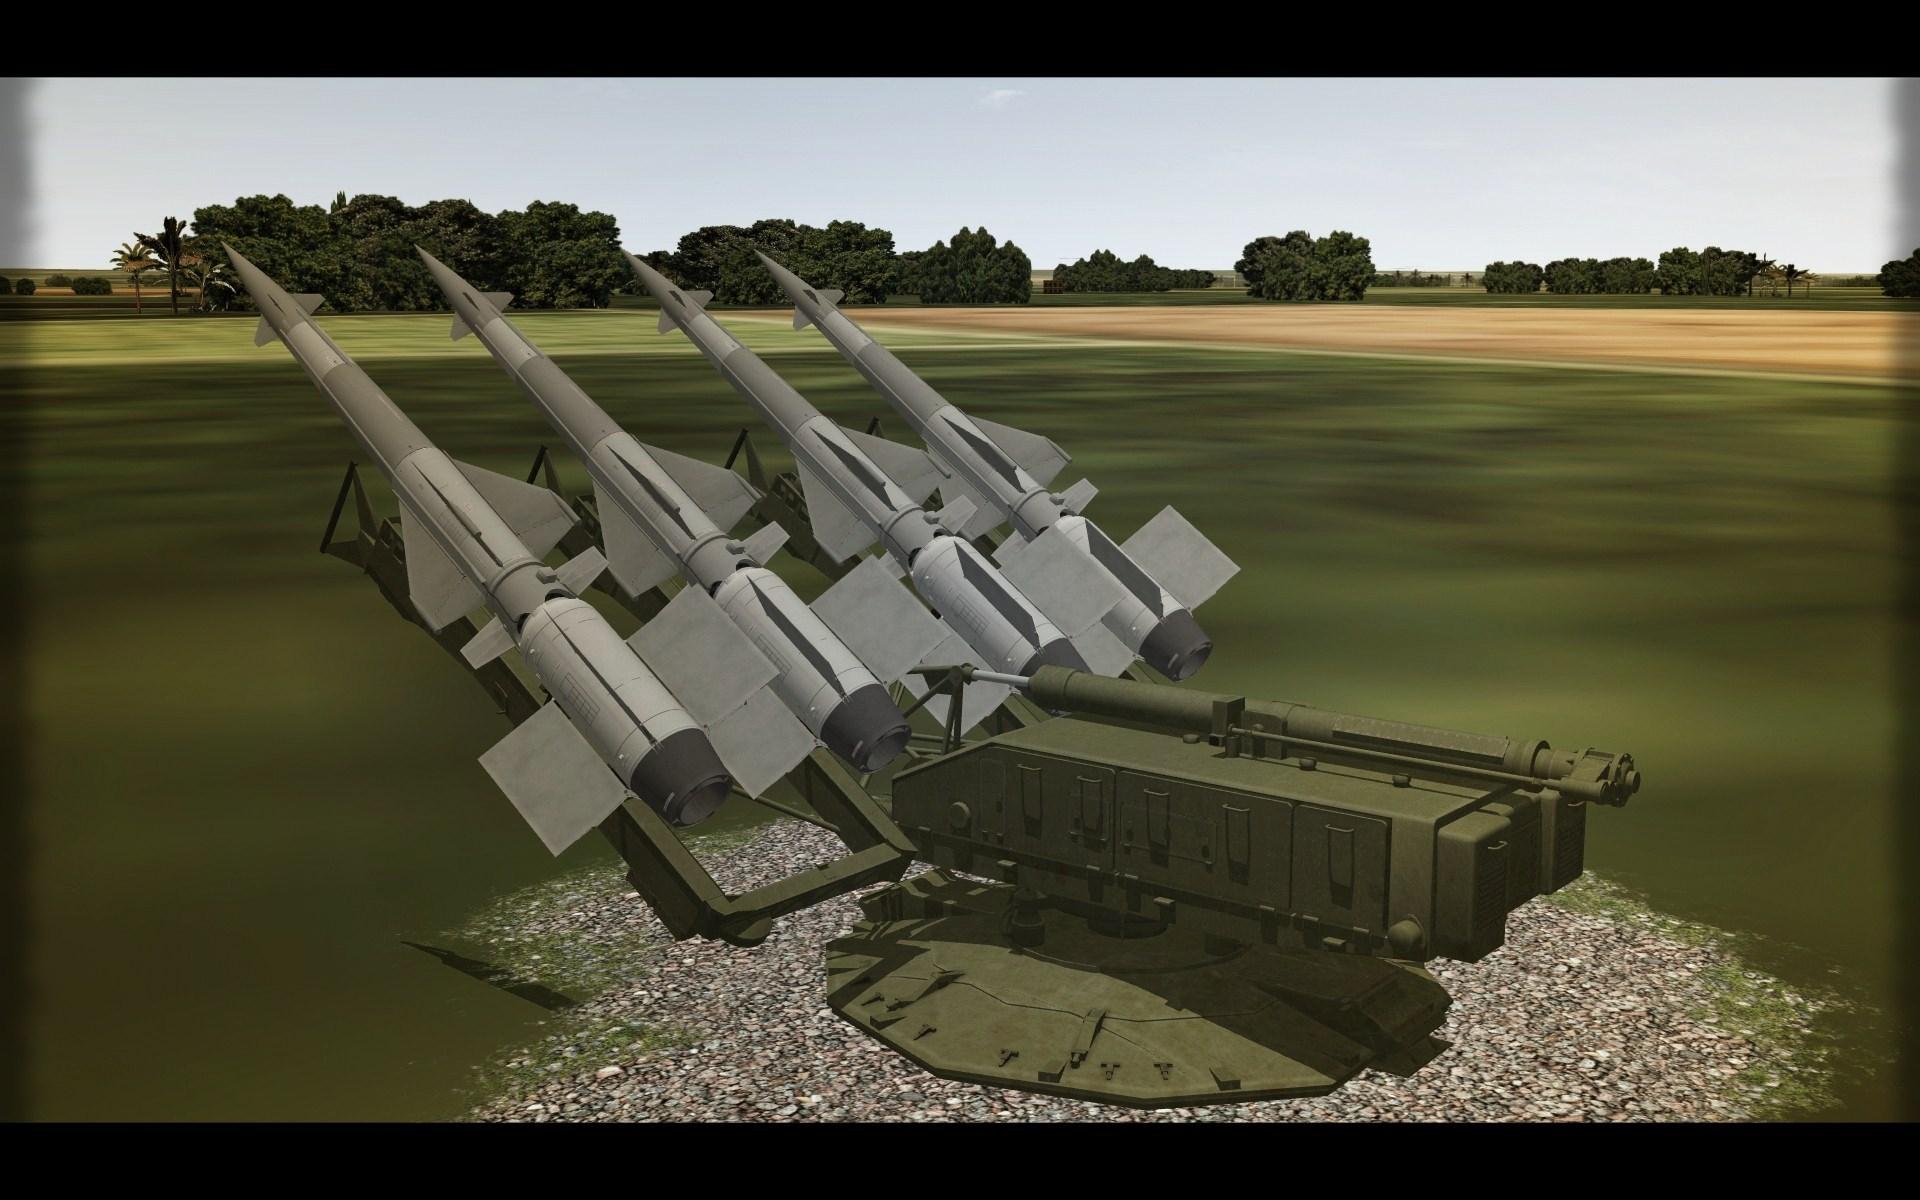 S-125 Neva. 5P71 & 5P73 Launchers.